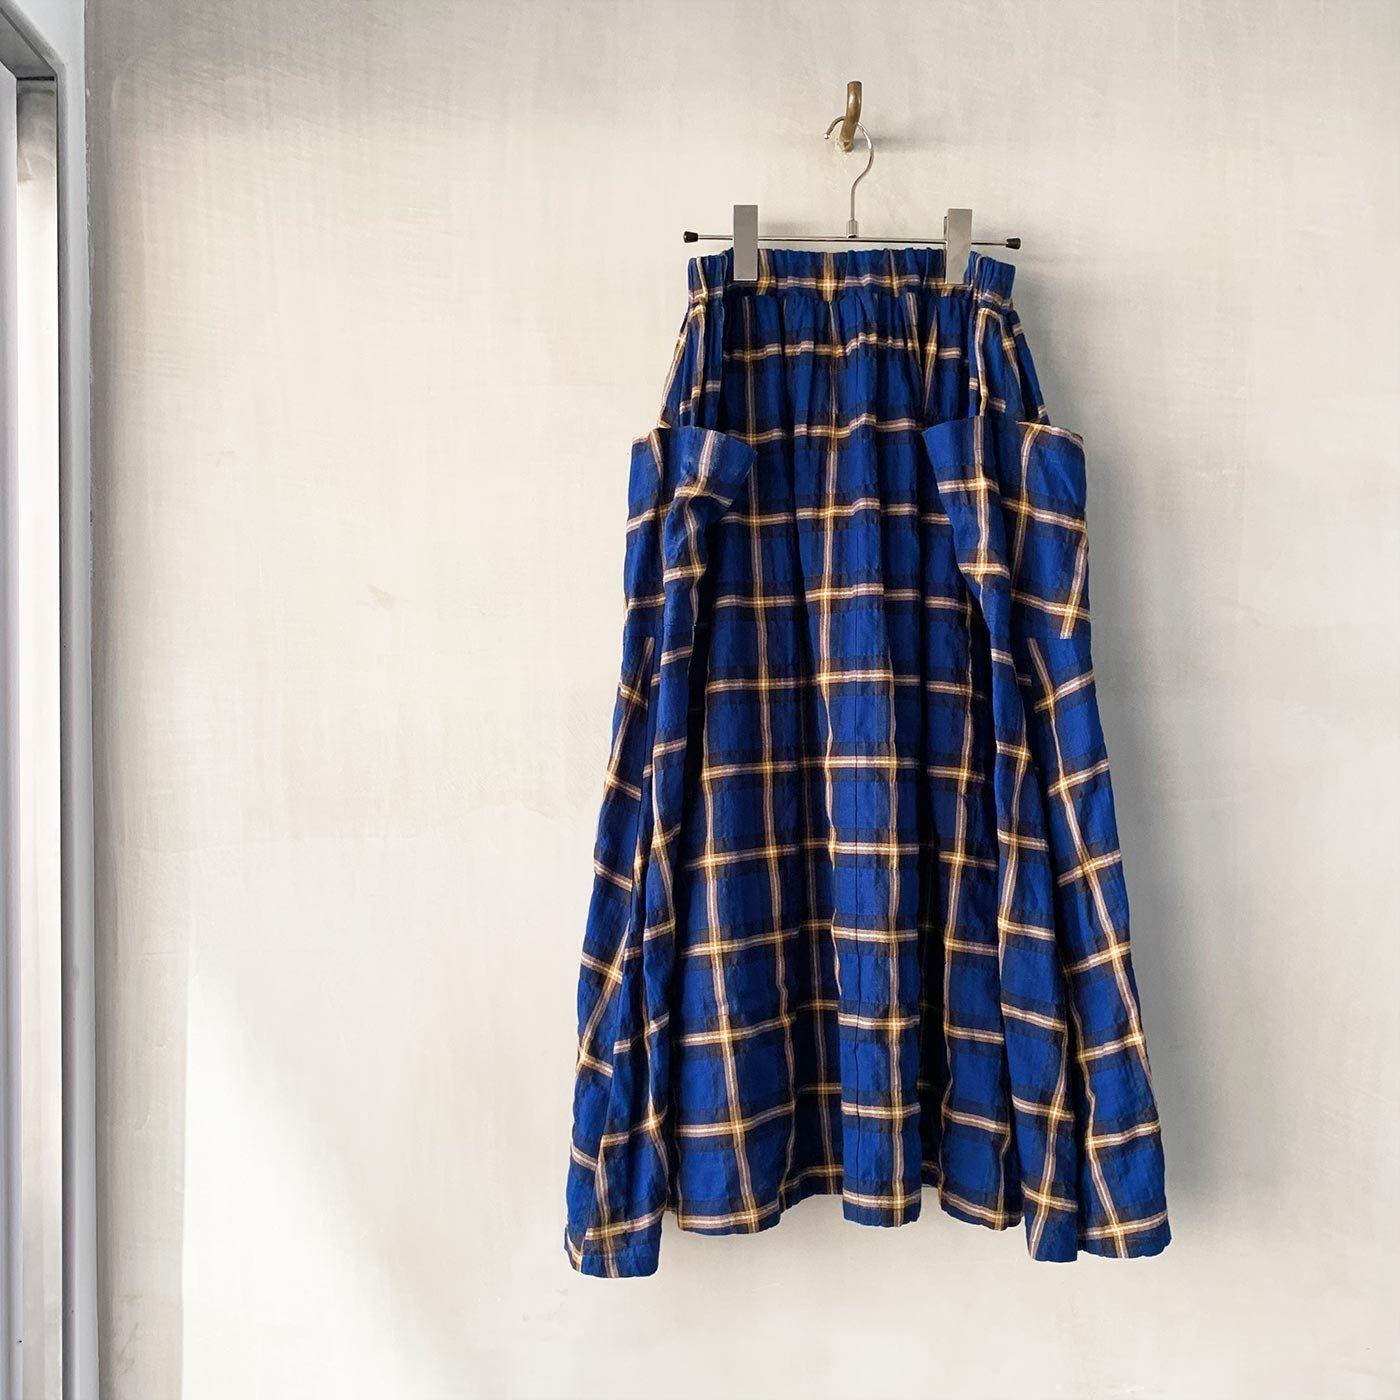 el:ment ヘリンボーンチェックの播州織生地が魅力 マルチポケットロングスカート